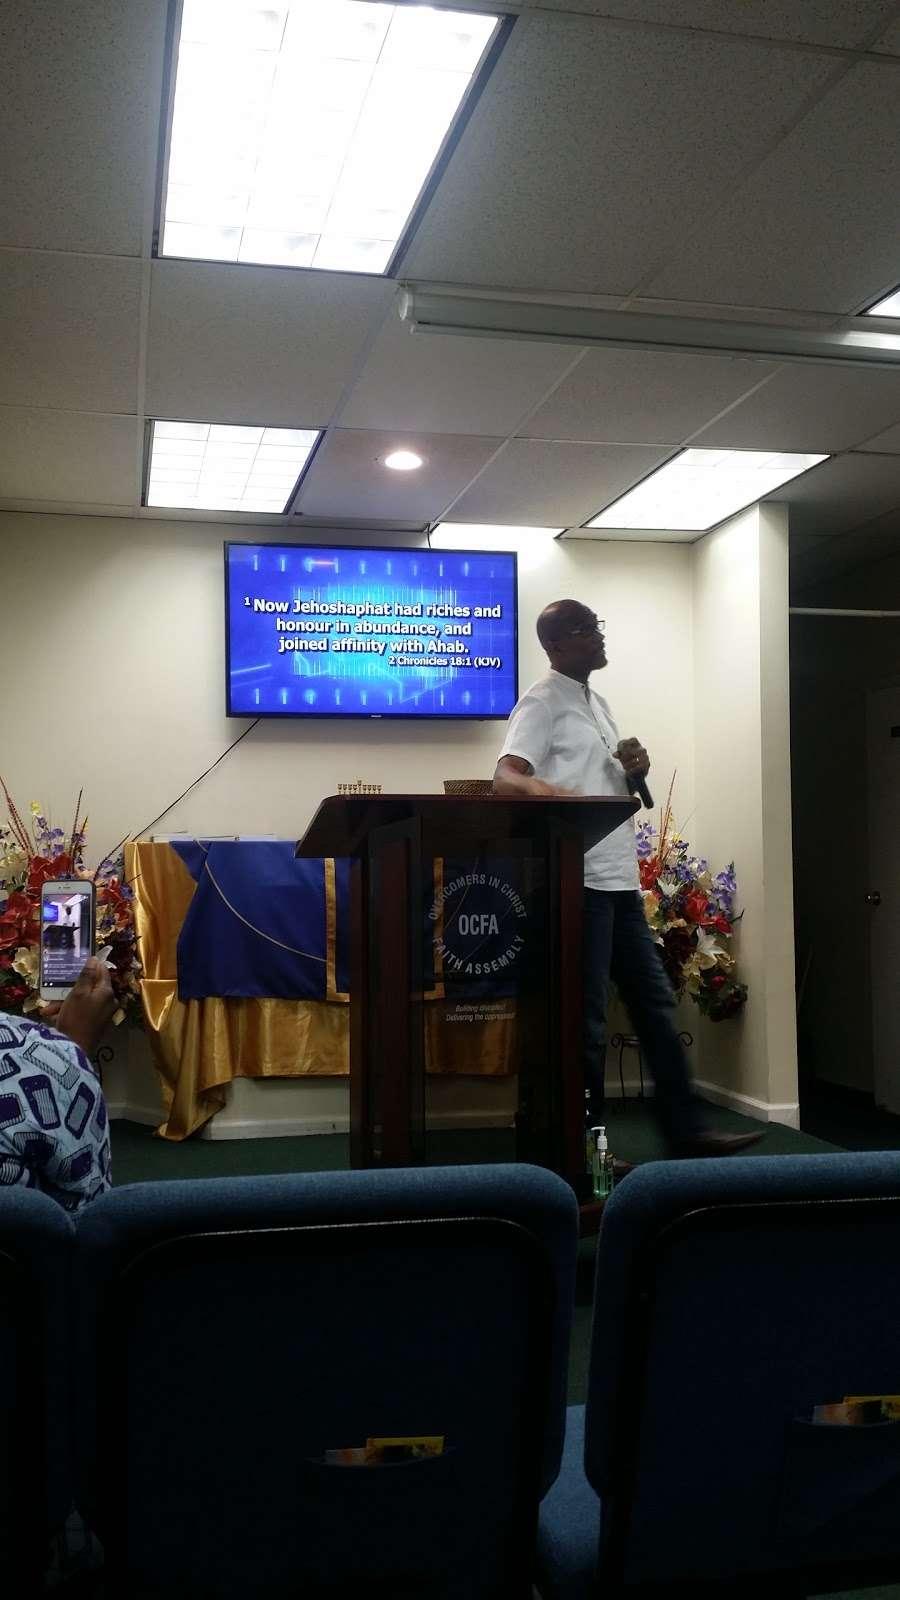 Overcomers In Christ Faith Assembly (OCFA) - church  | Photo 1 of 1 | Address: 557 Rogers Ave, Brooklyn, NY 11225, USA | Phone: (929) 261-8599